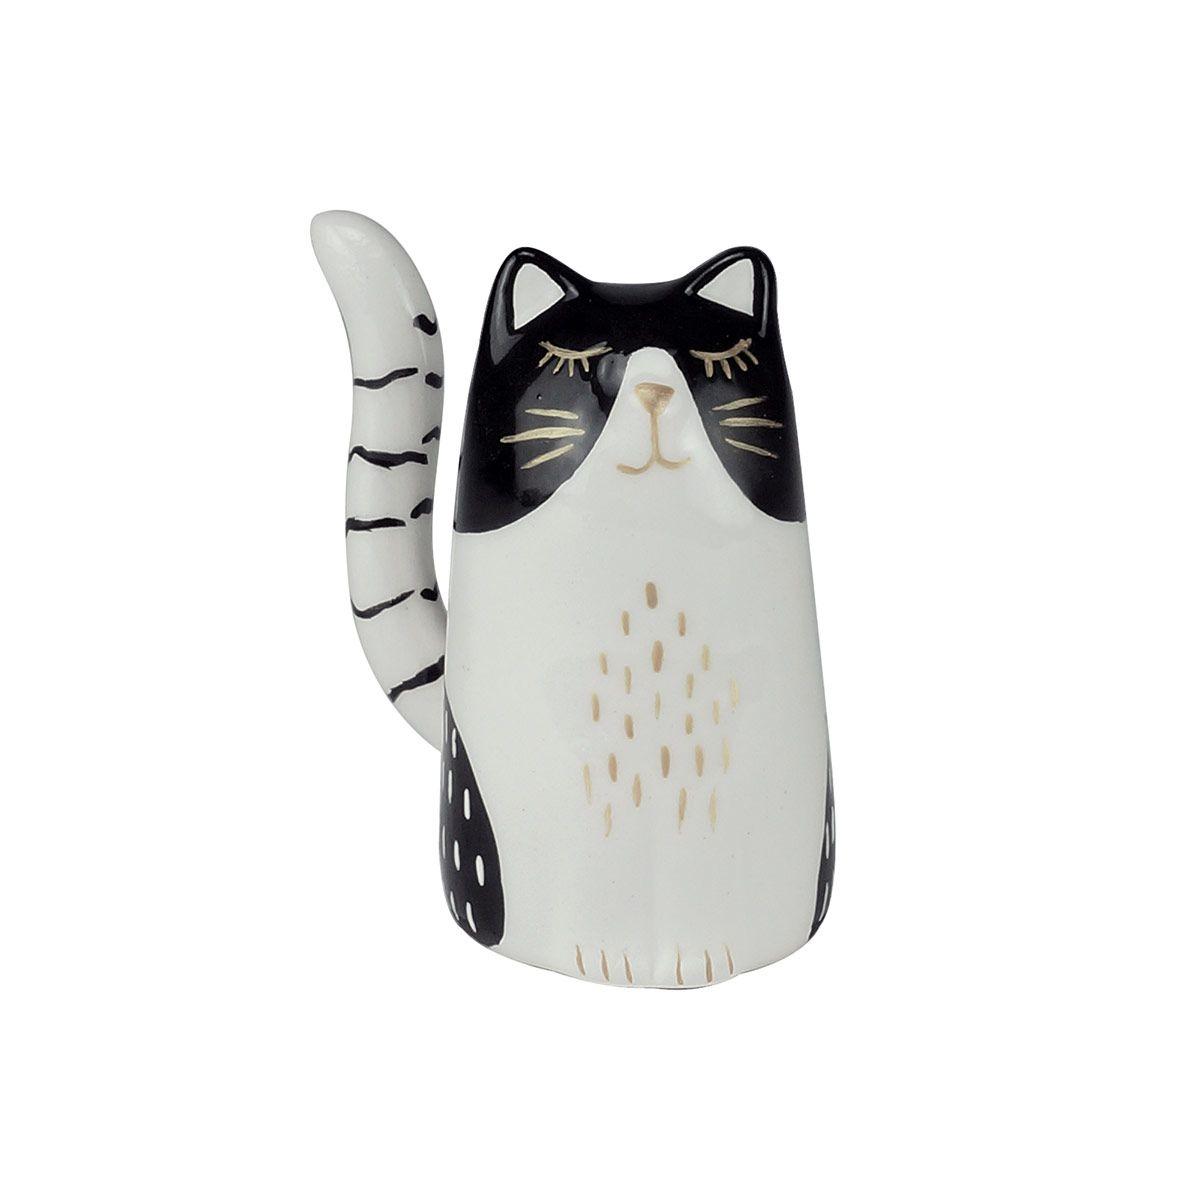 Mini Gato em Cerâmica Preto e Branco 5 x 3,8 x 6,3 cm